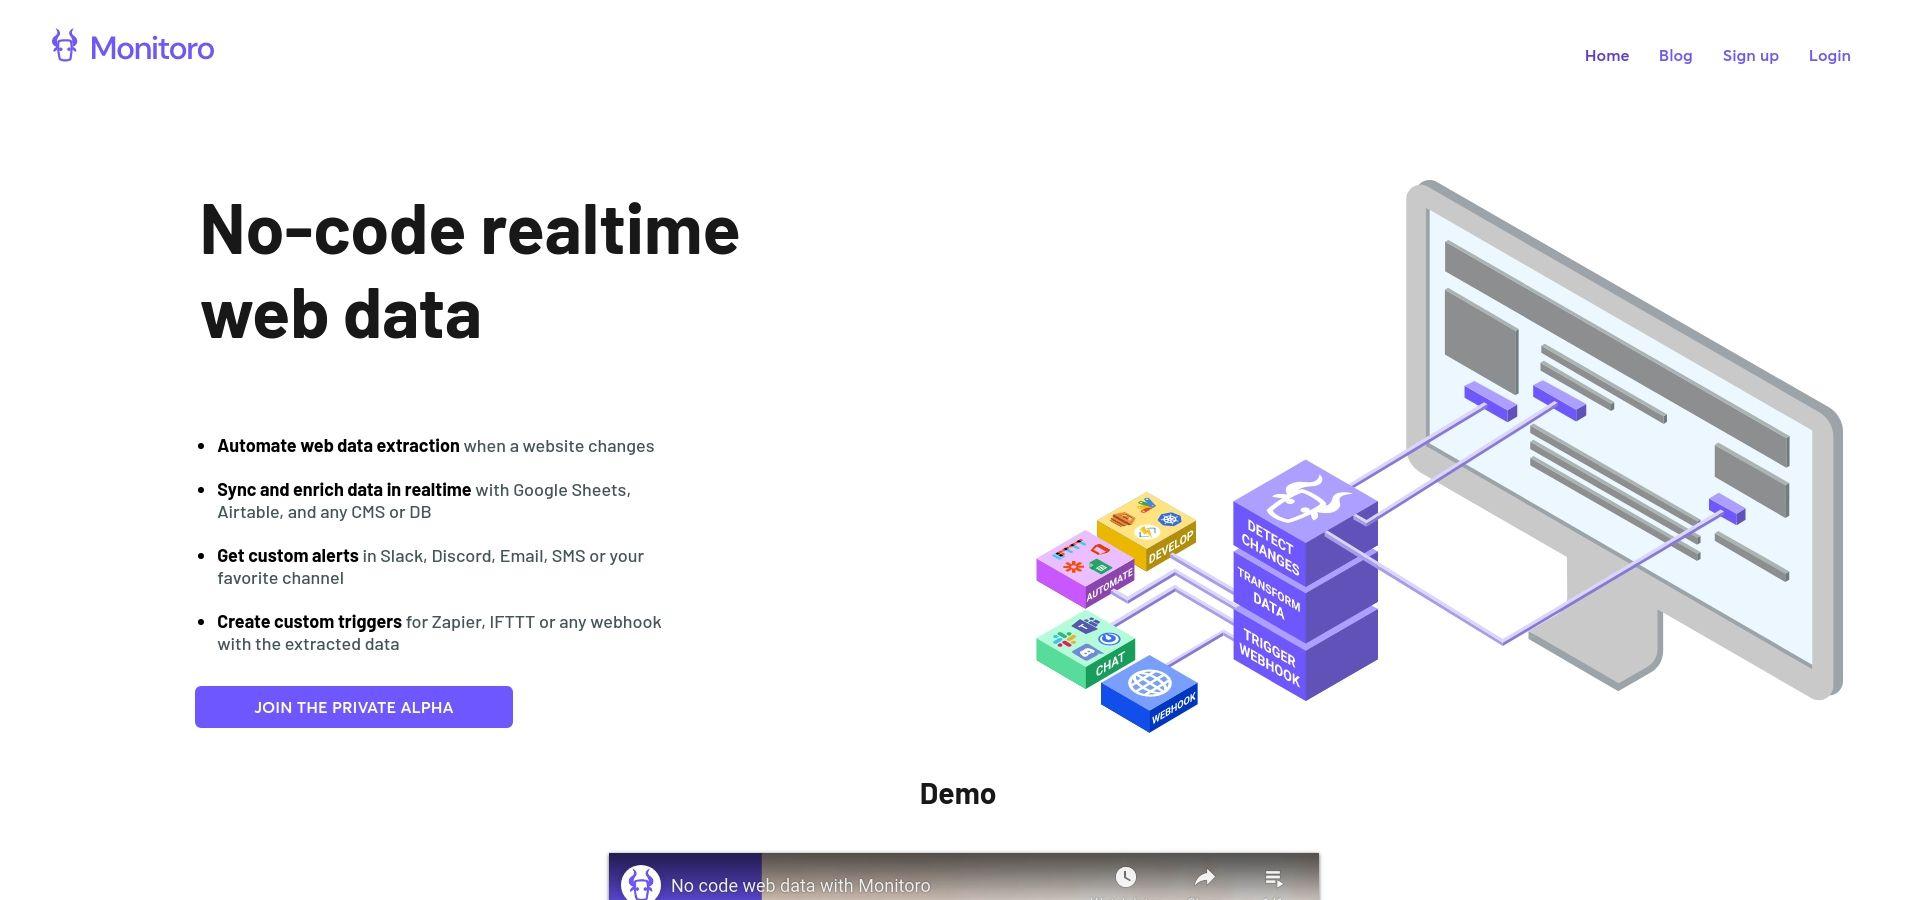 No-code website monitoring and data integration | Monitoro